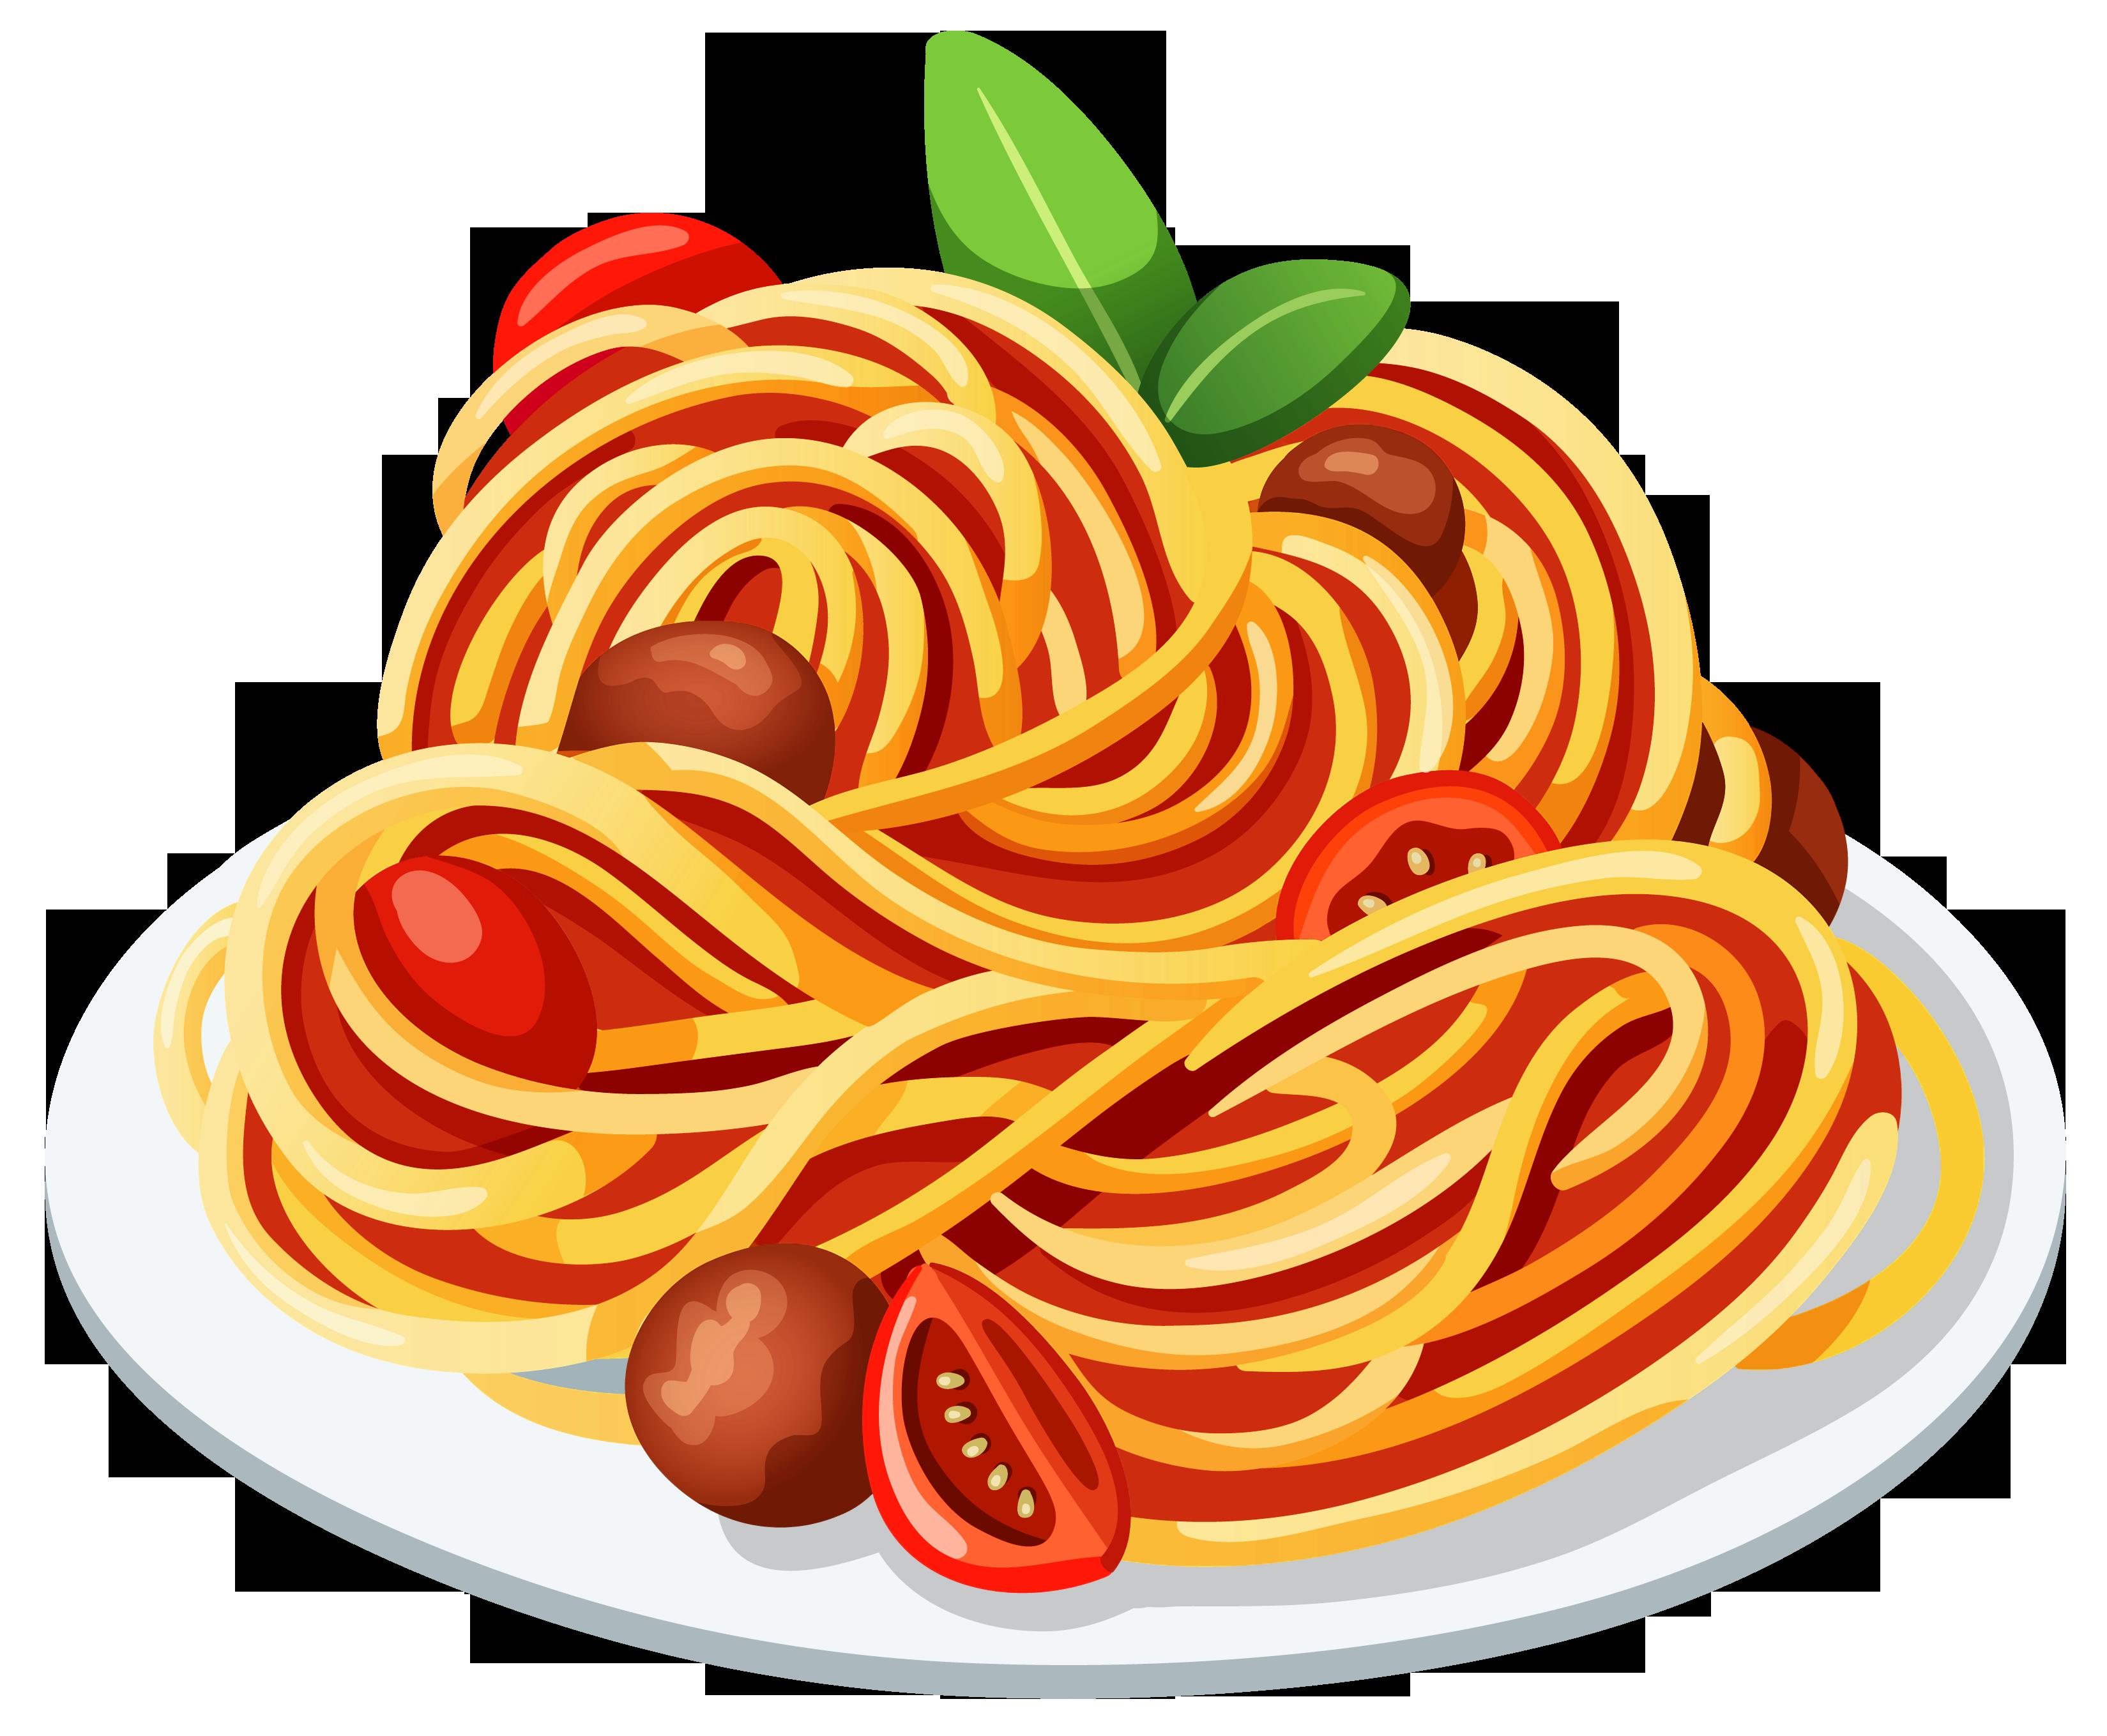 Spaghetti bowl clipart picture transparent stock Spaghetti pasta clipart free images jpg - Clipartix picture transparent stock